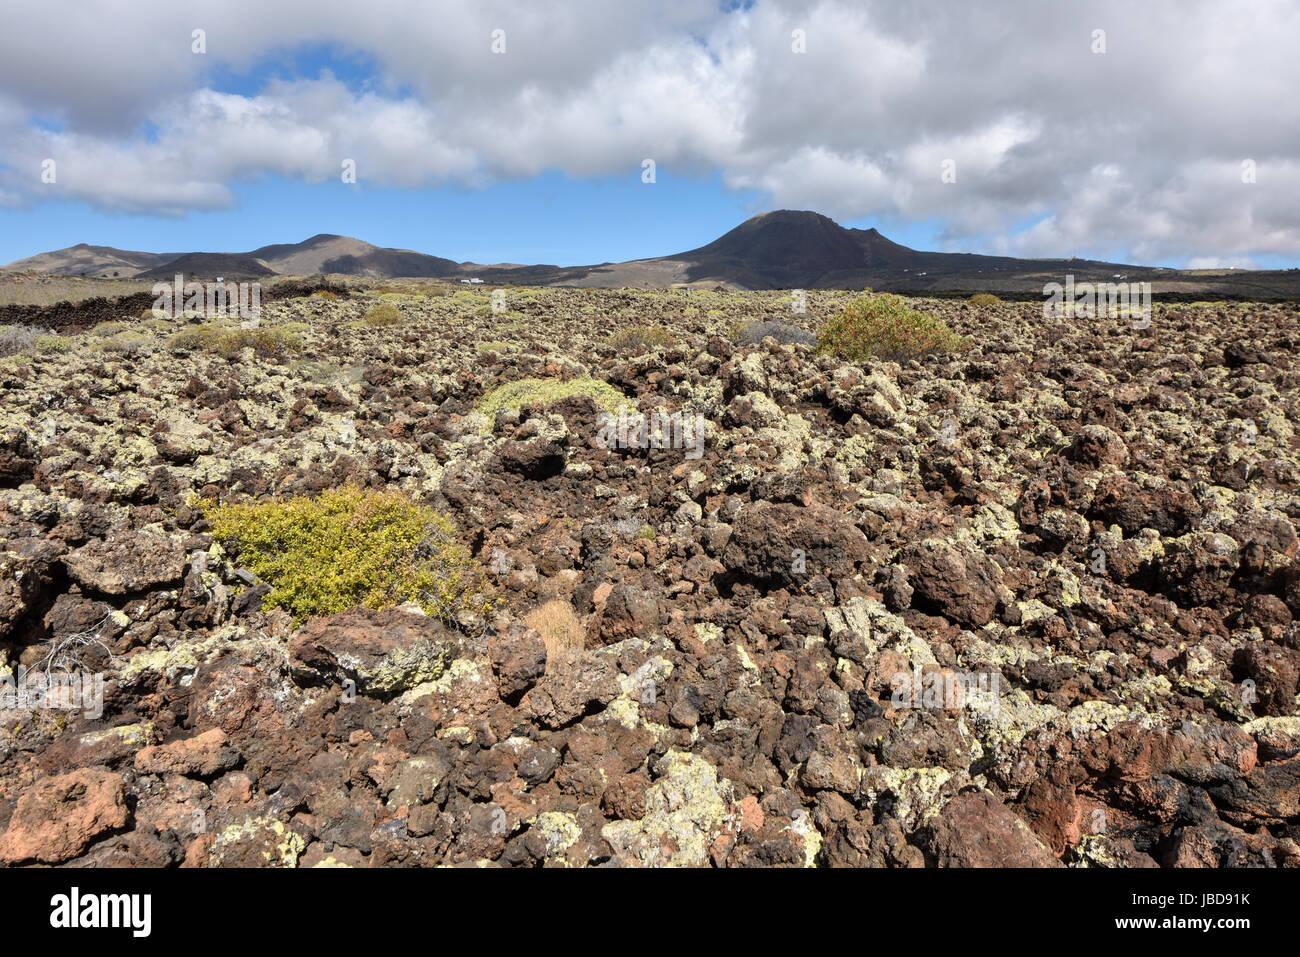 Interesting volcanic landscape in Lanzarote near Jameos del Agua cave. Canary Islands, Spain - Stock Image